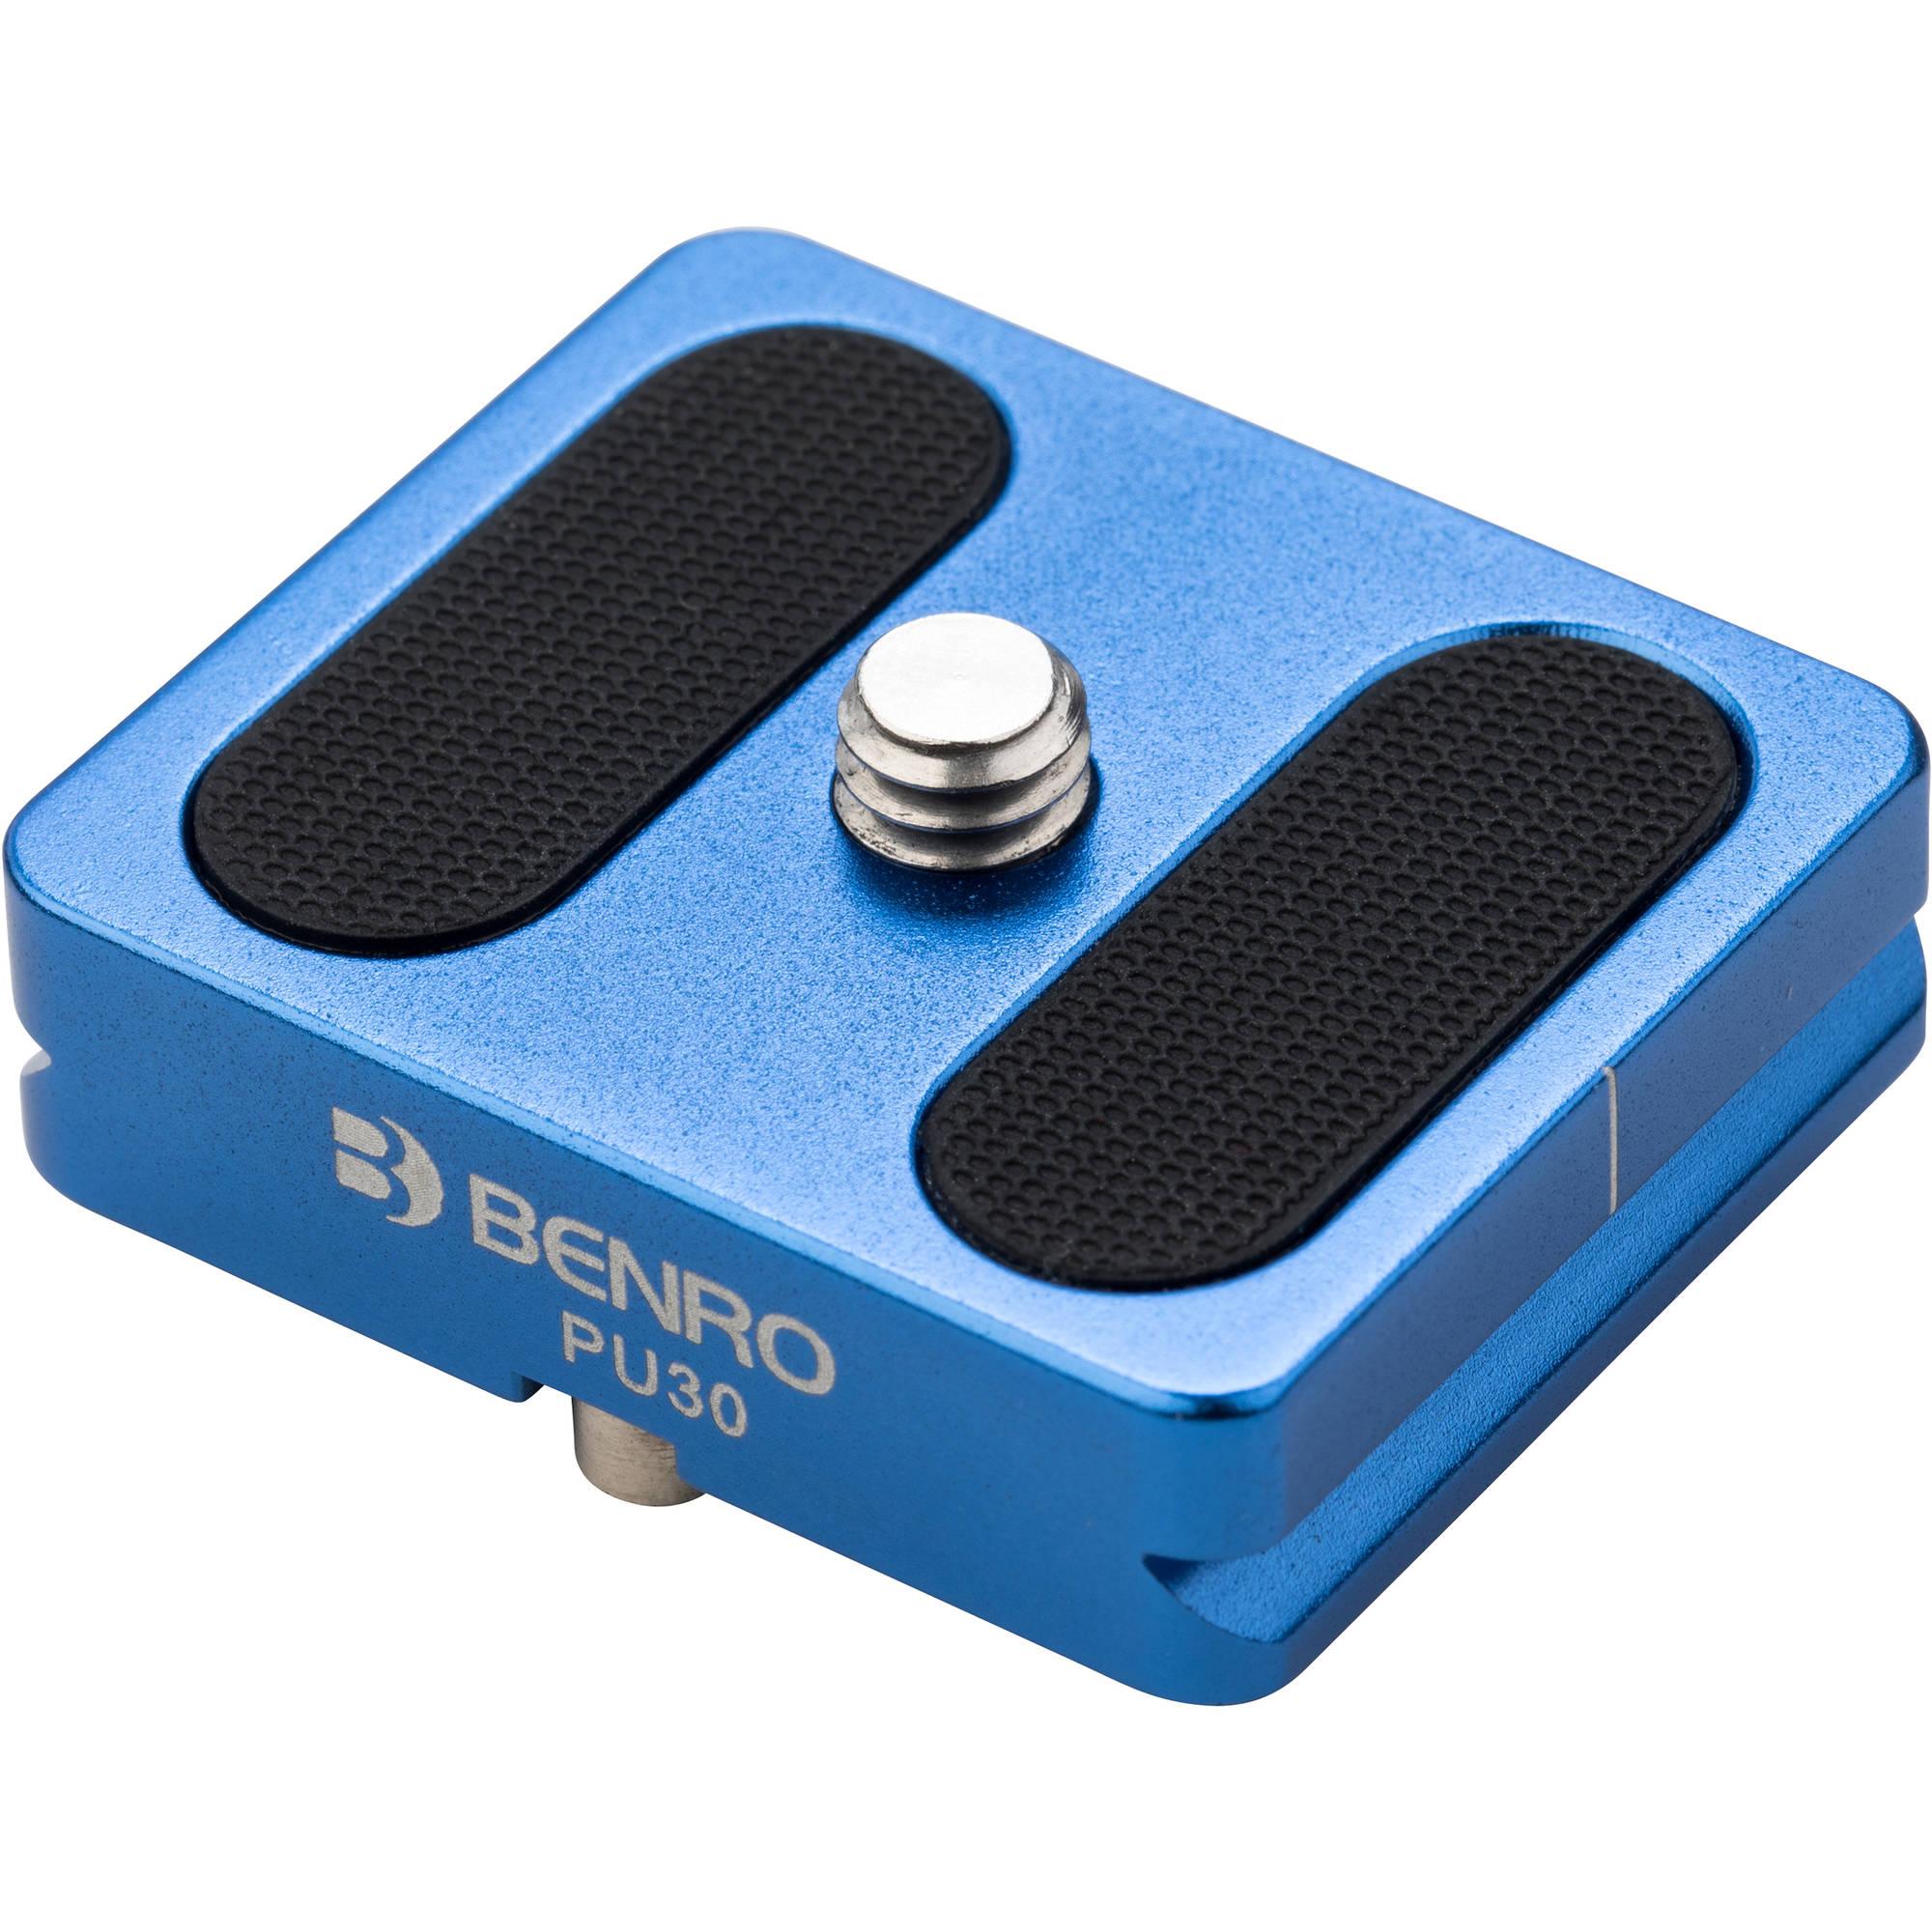 PU-300 Quick Release Plate 300mm fit for Benro Arca Swiss Camera Tripod Ballhead